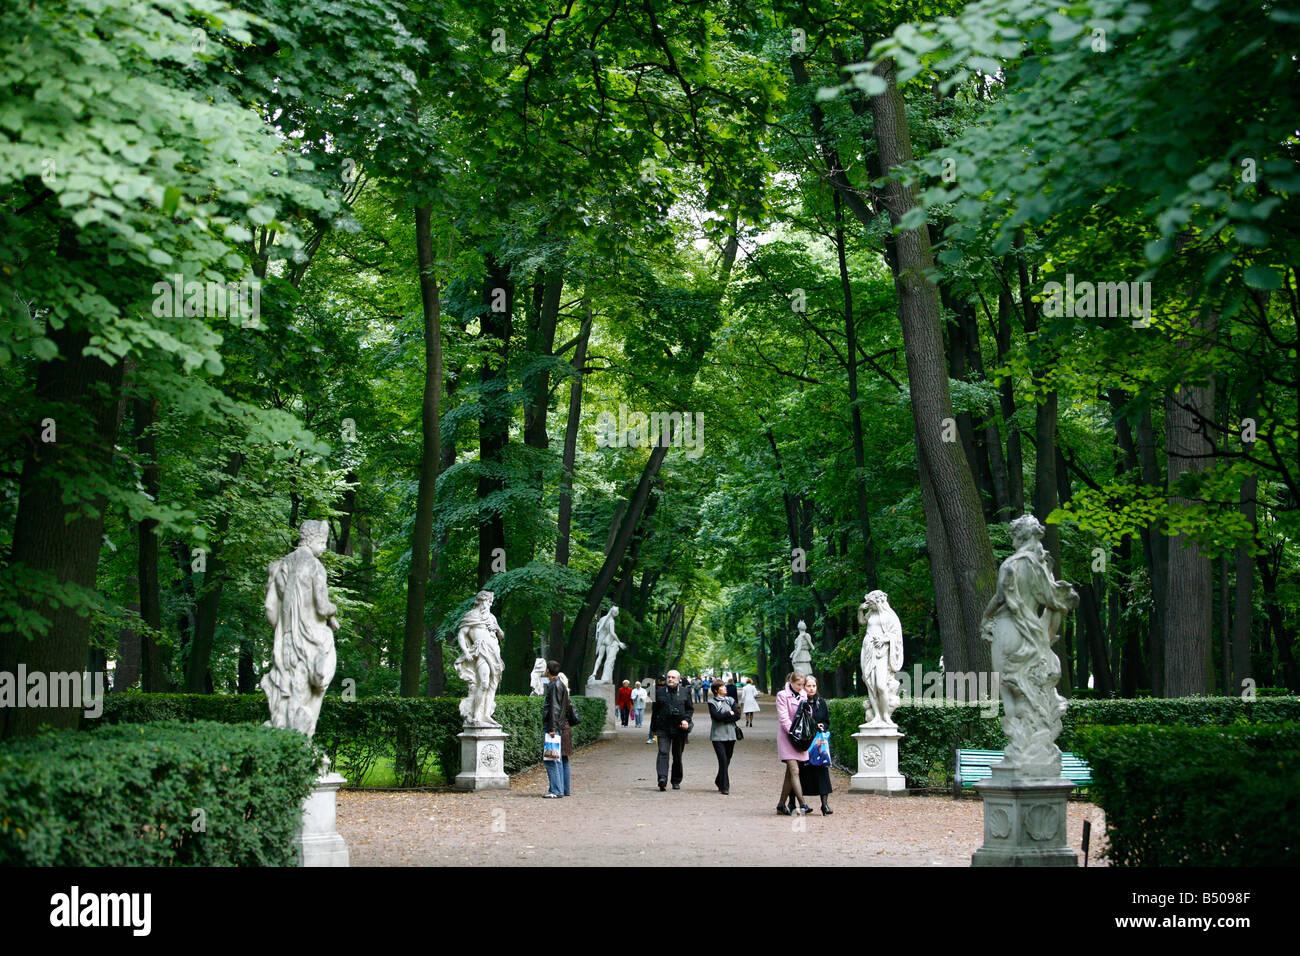 Aug 2008 - The Summer Garden St Petersburg Russia - Stock Image